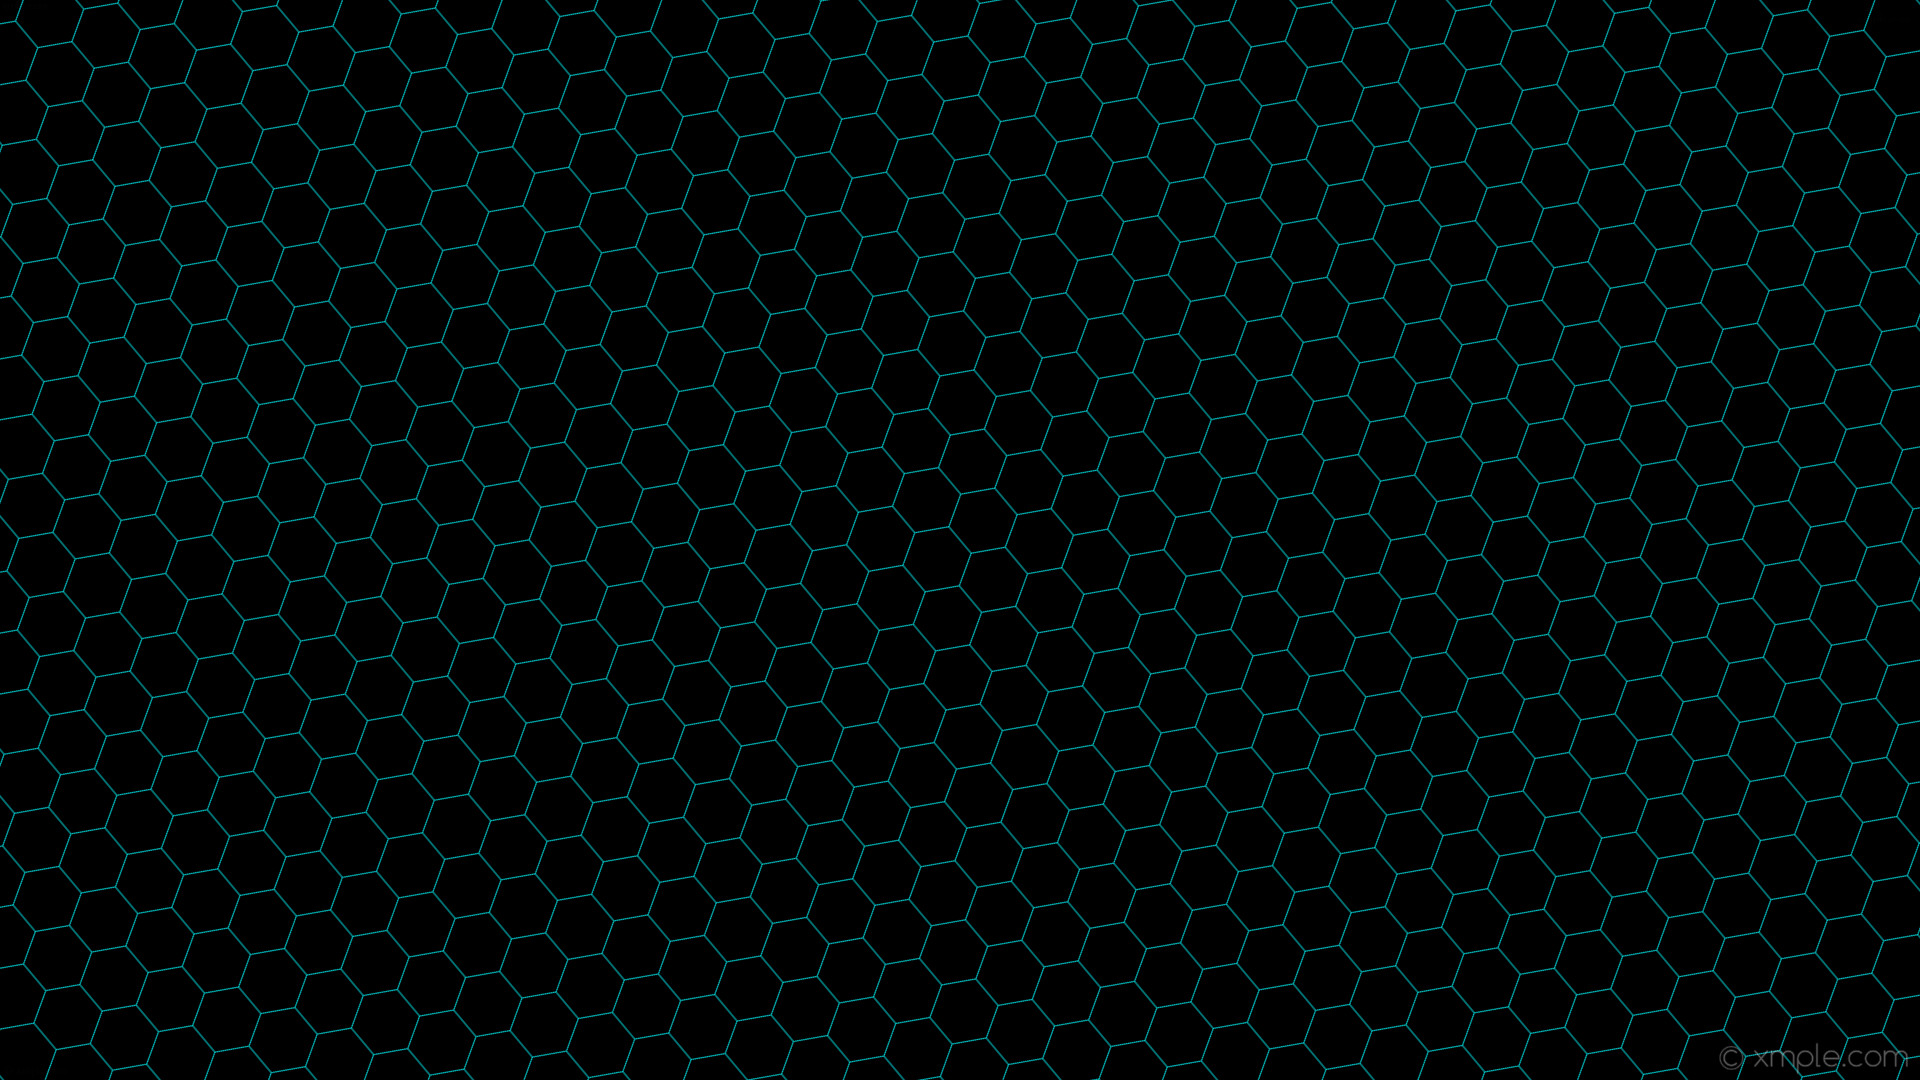 wallpaper honeycomb black blue hexagon beehive dark turquoise #000000  #00ced1 diagonal 40° 1px